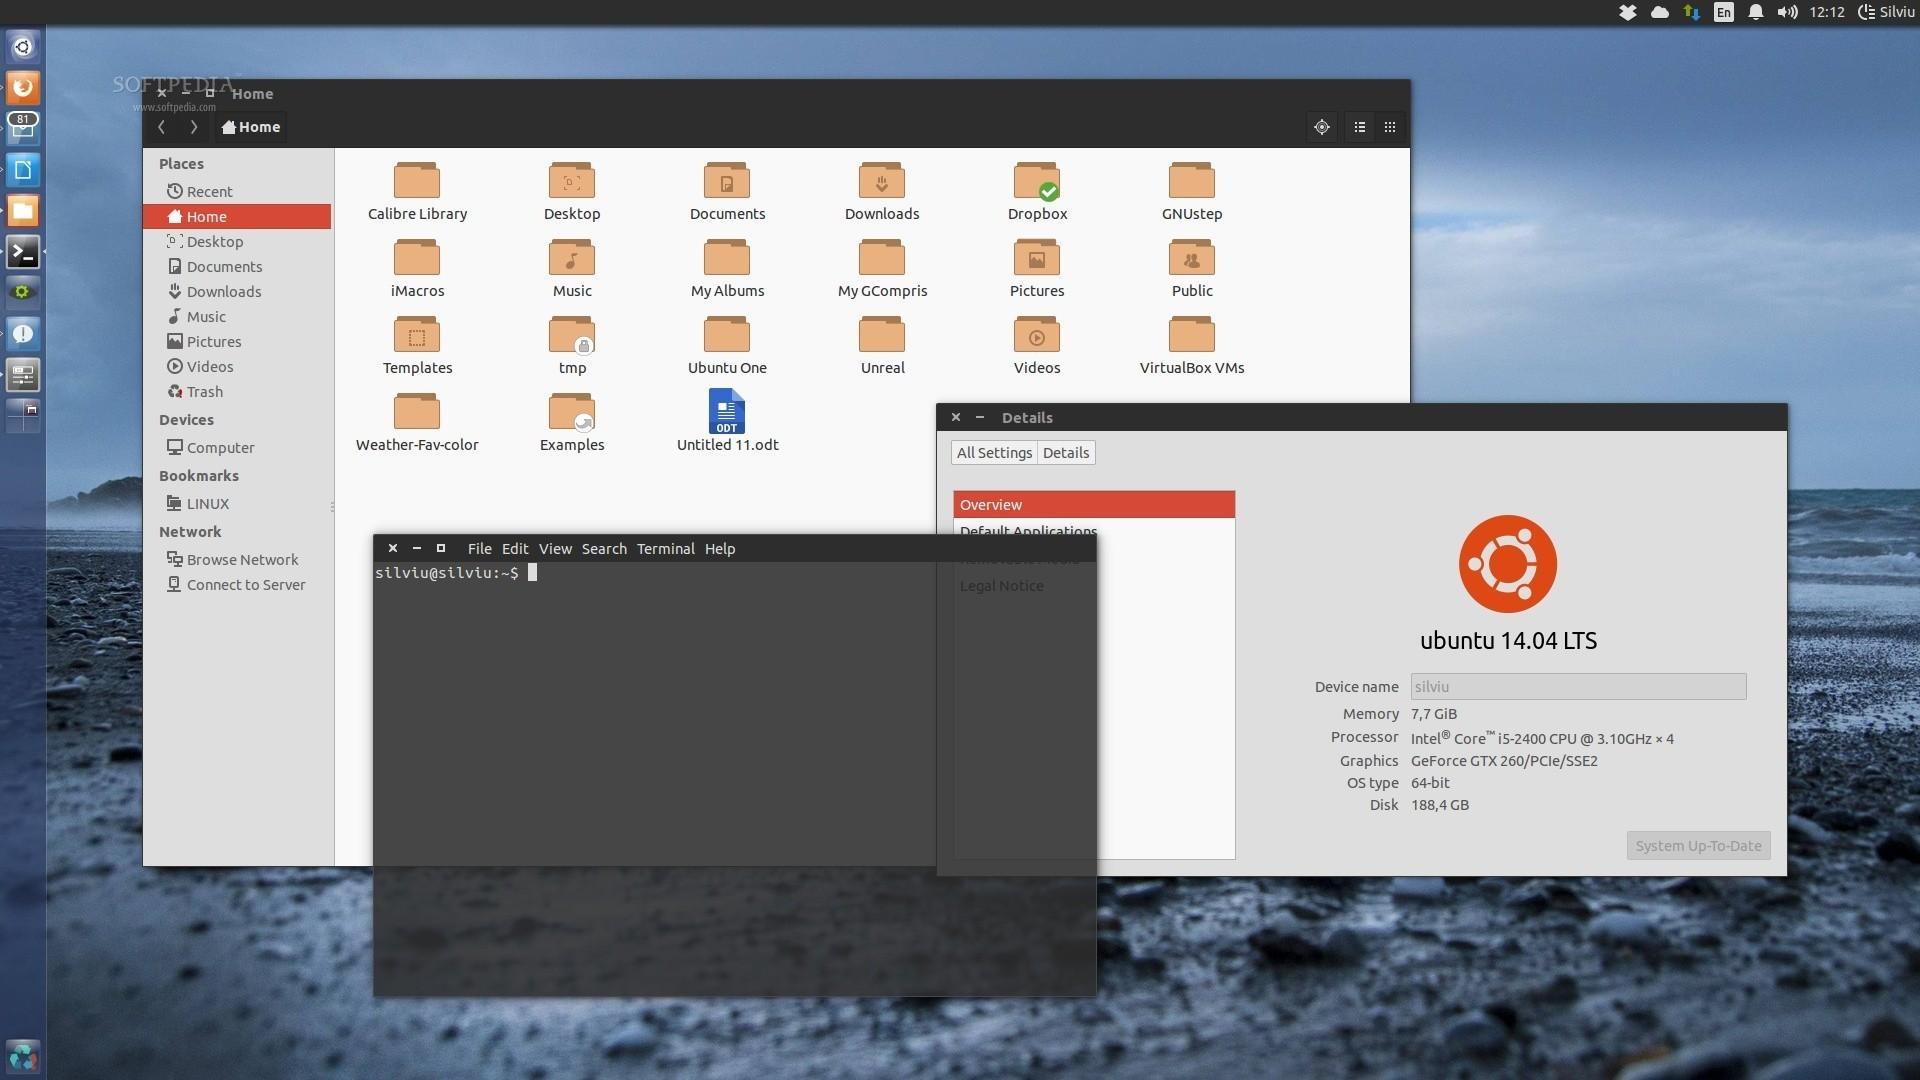 Canonical Closes Linux Kernel Vulnerabilities in Ubuntu 14 04 LTS